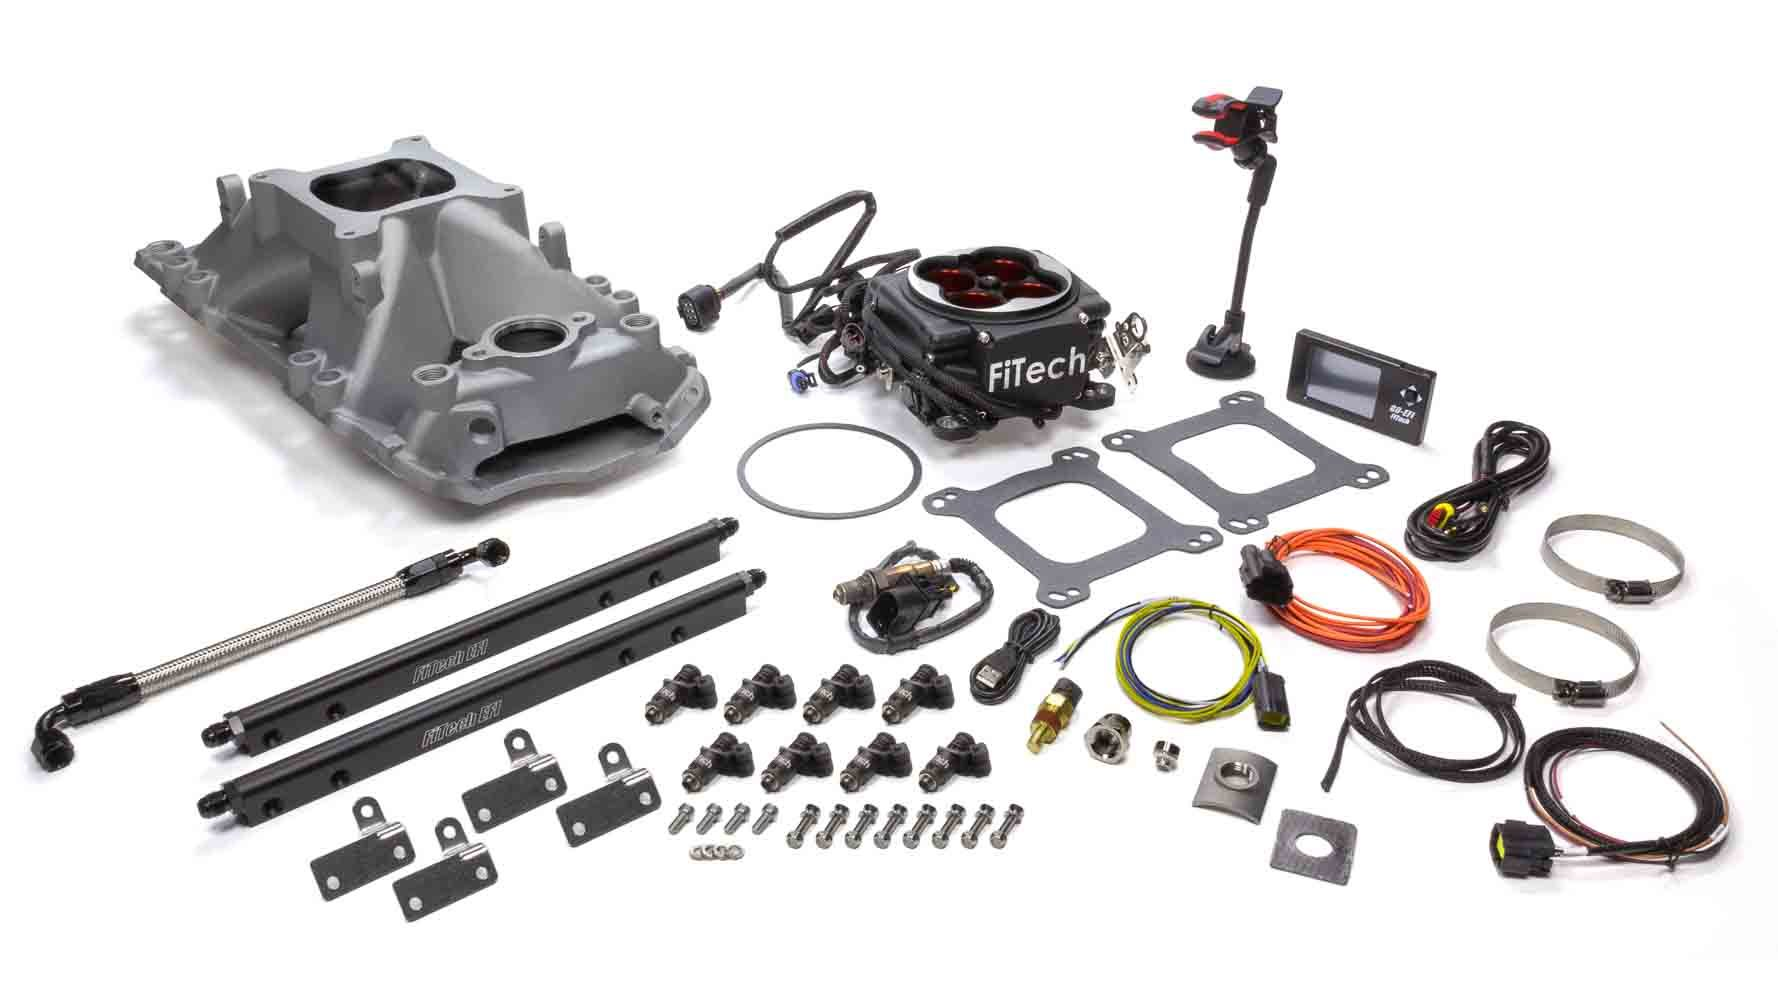 Fitech Fuel Injection 37854 Fuel Injection, Go Port EFI, Multi Port, 42 lb/hr Injectors, 900 CFM, Aluminum, Black Anodize, Small Block Chevy, Kit